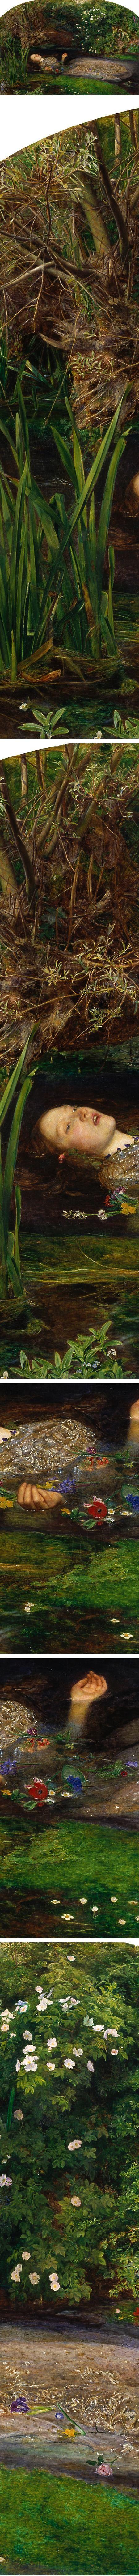 Eye Candy for Today: John Everett Millais' Ophelia